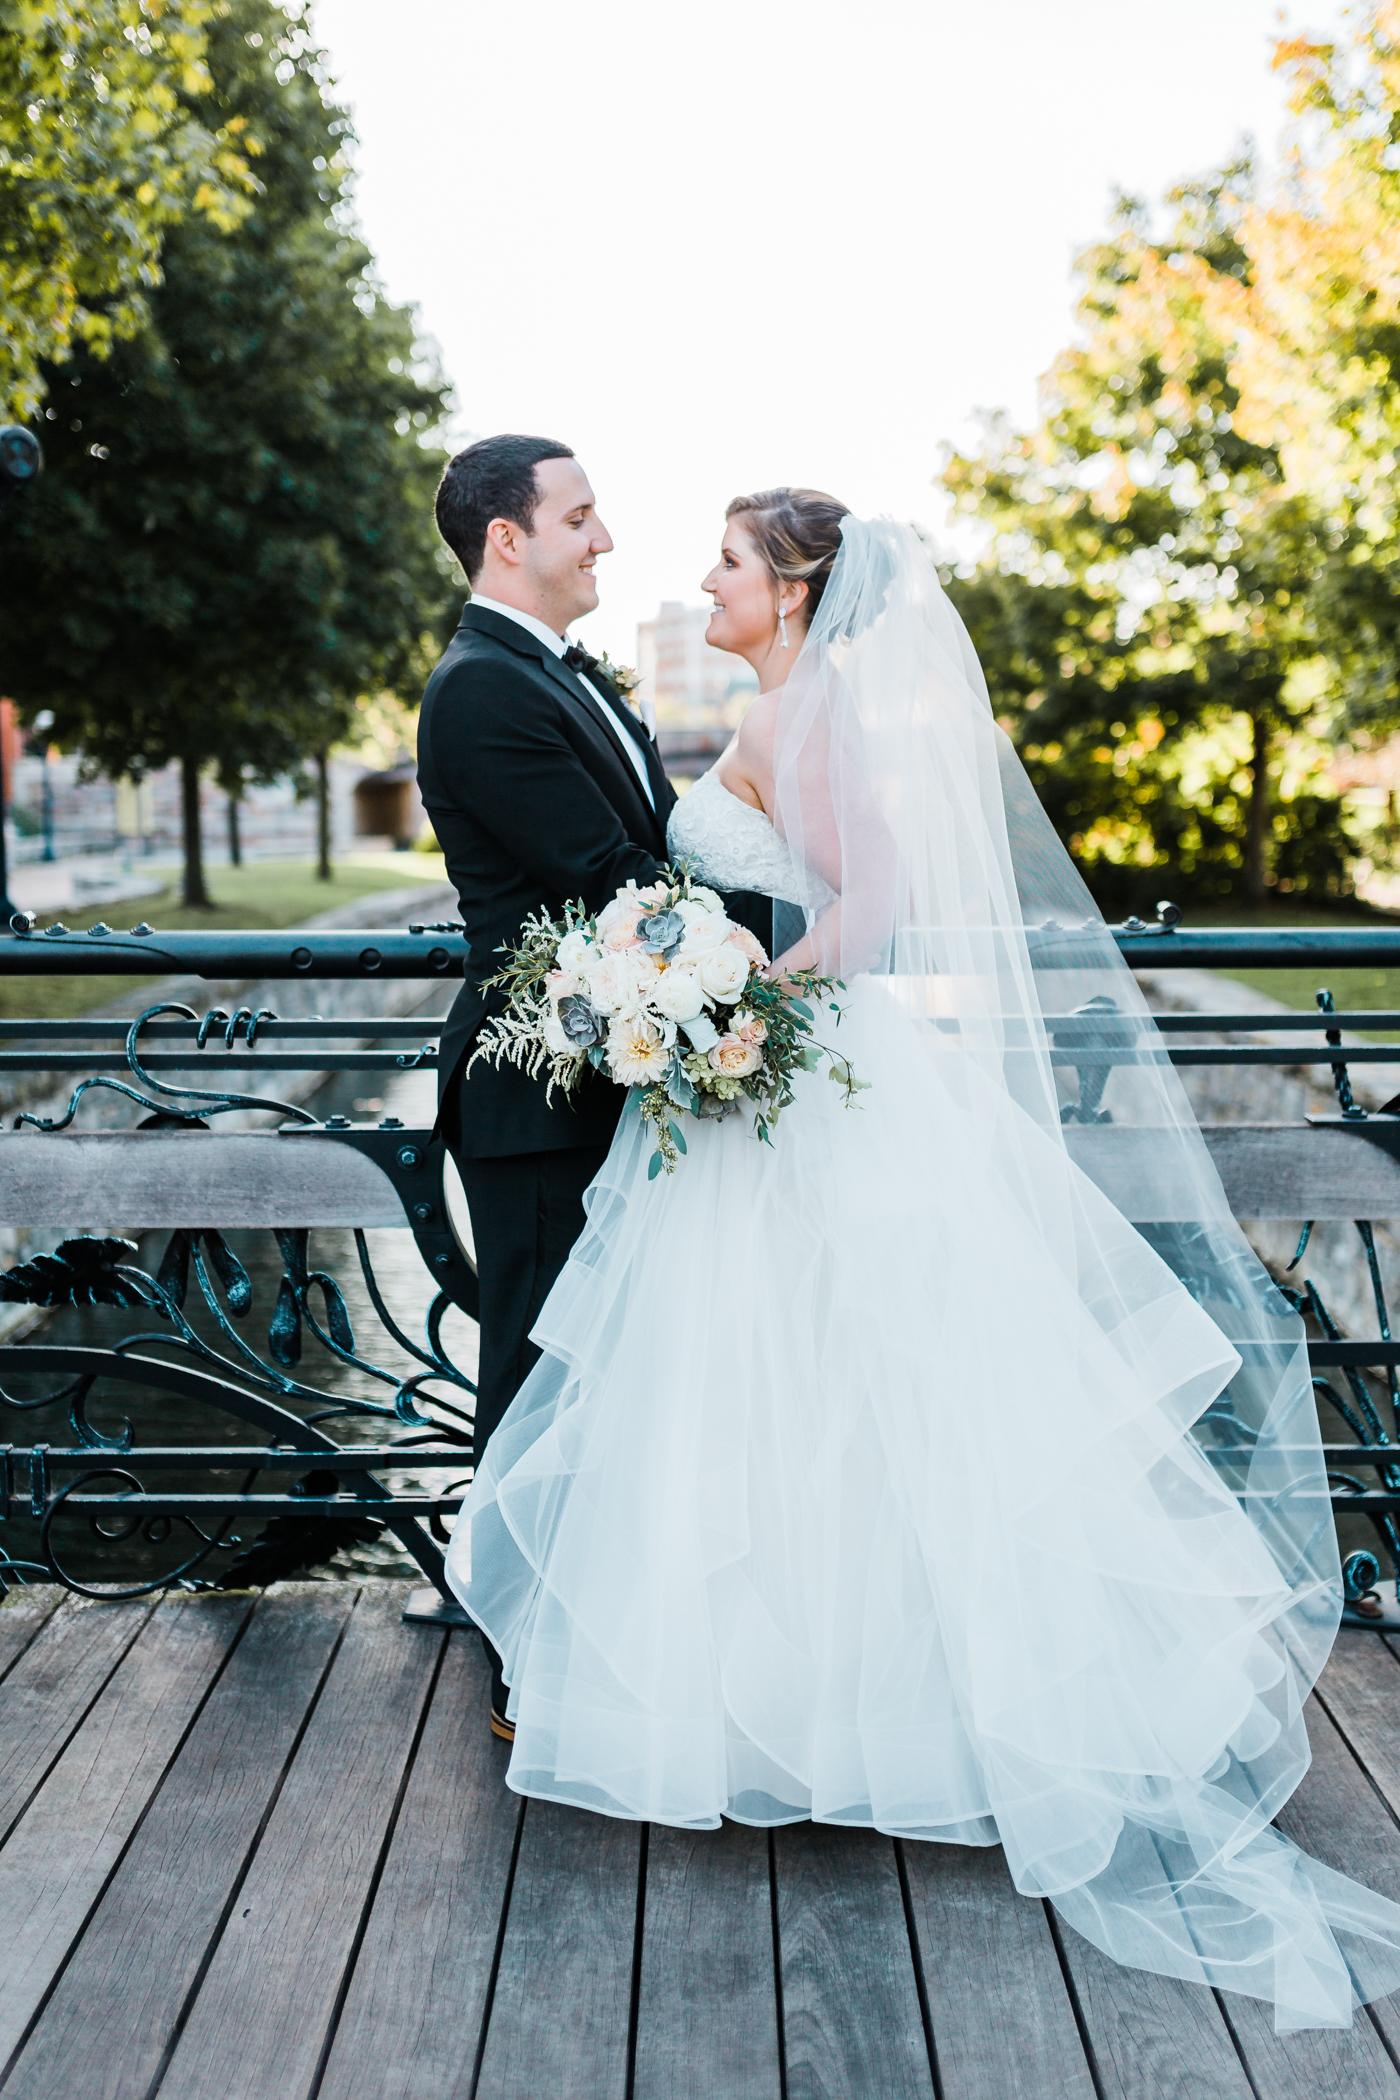 Maryland wedding bride and groom on bridge - unique wedding dress designs - modern wedding venues in Maryland